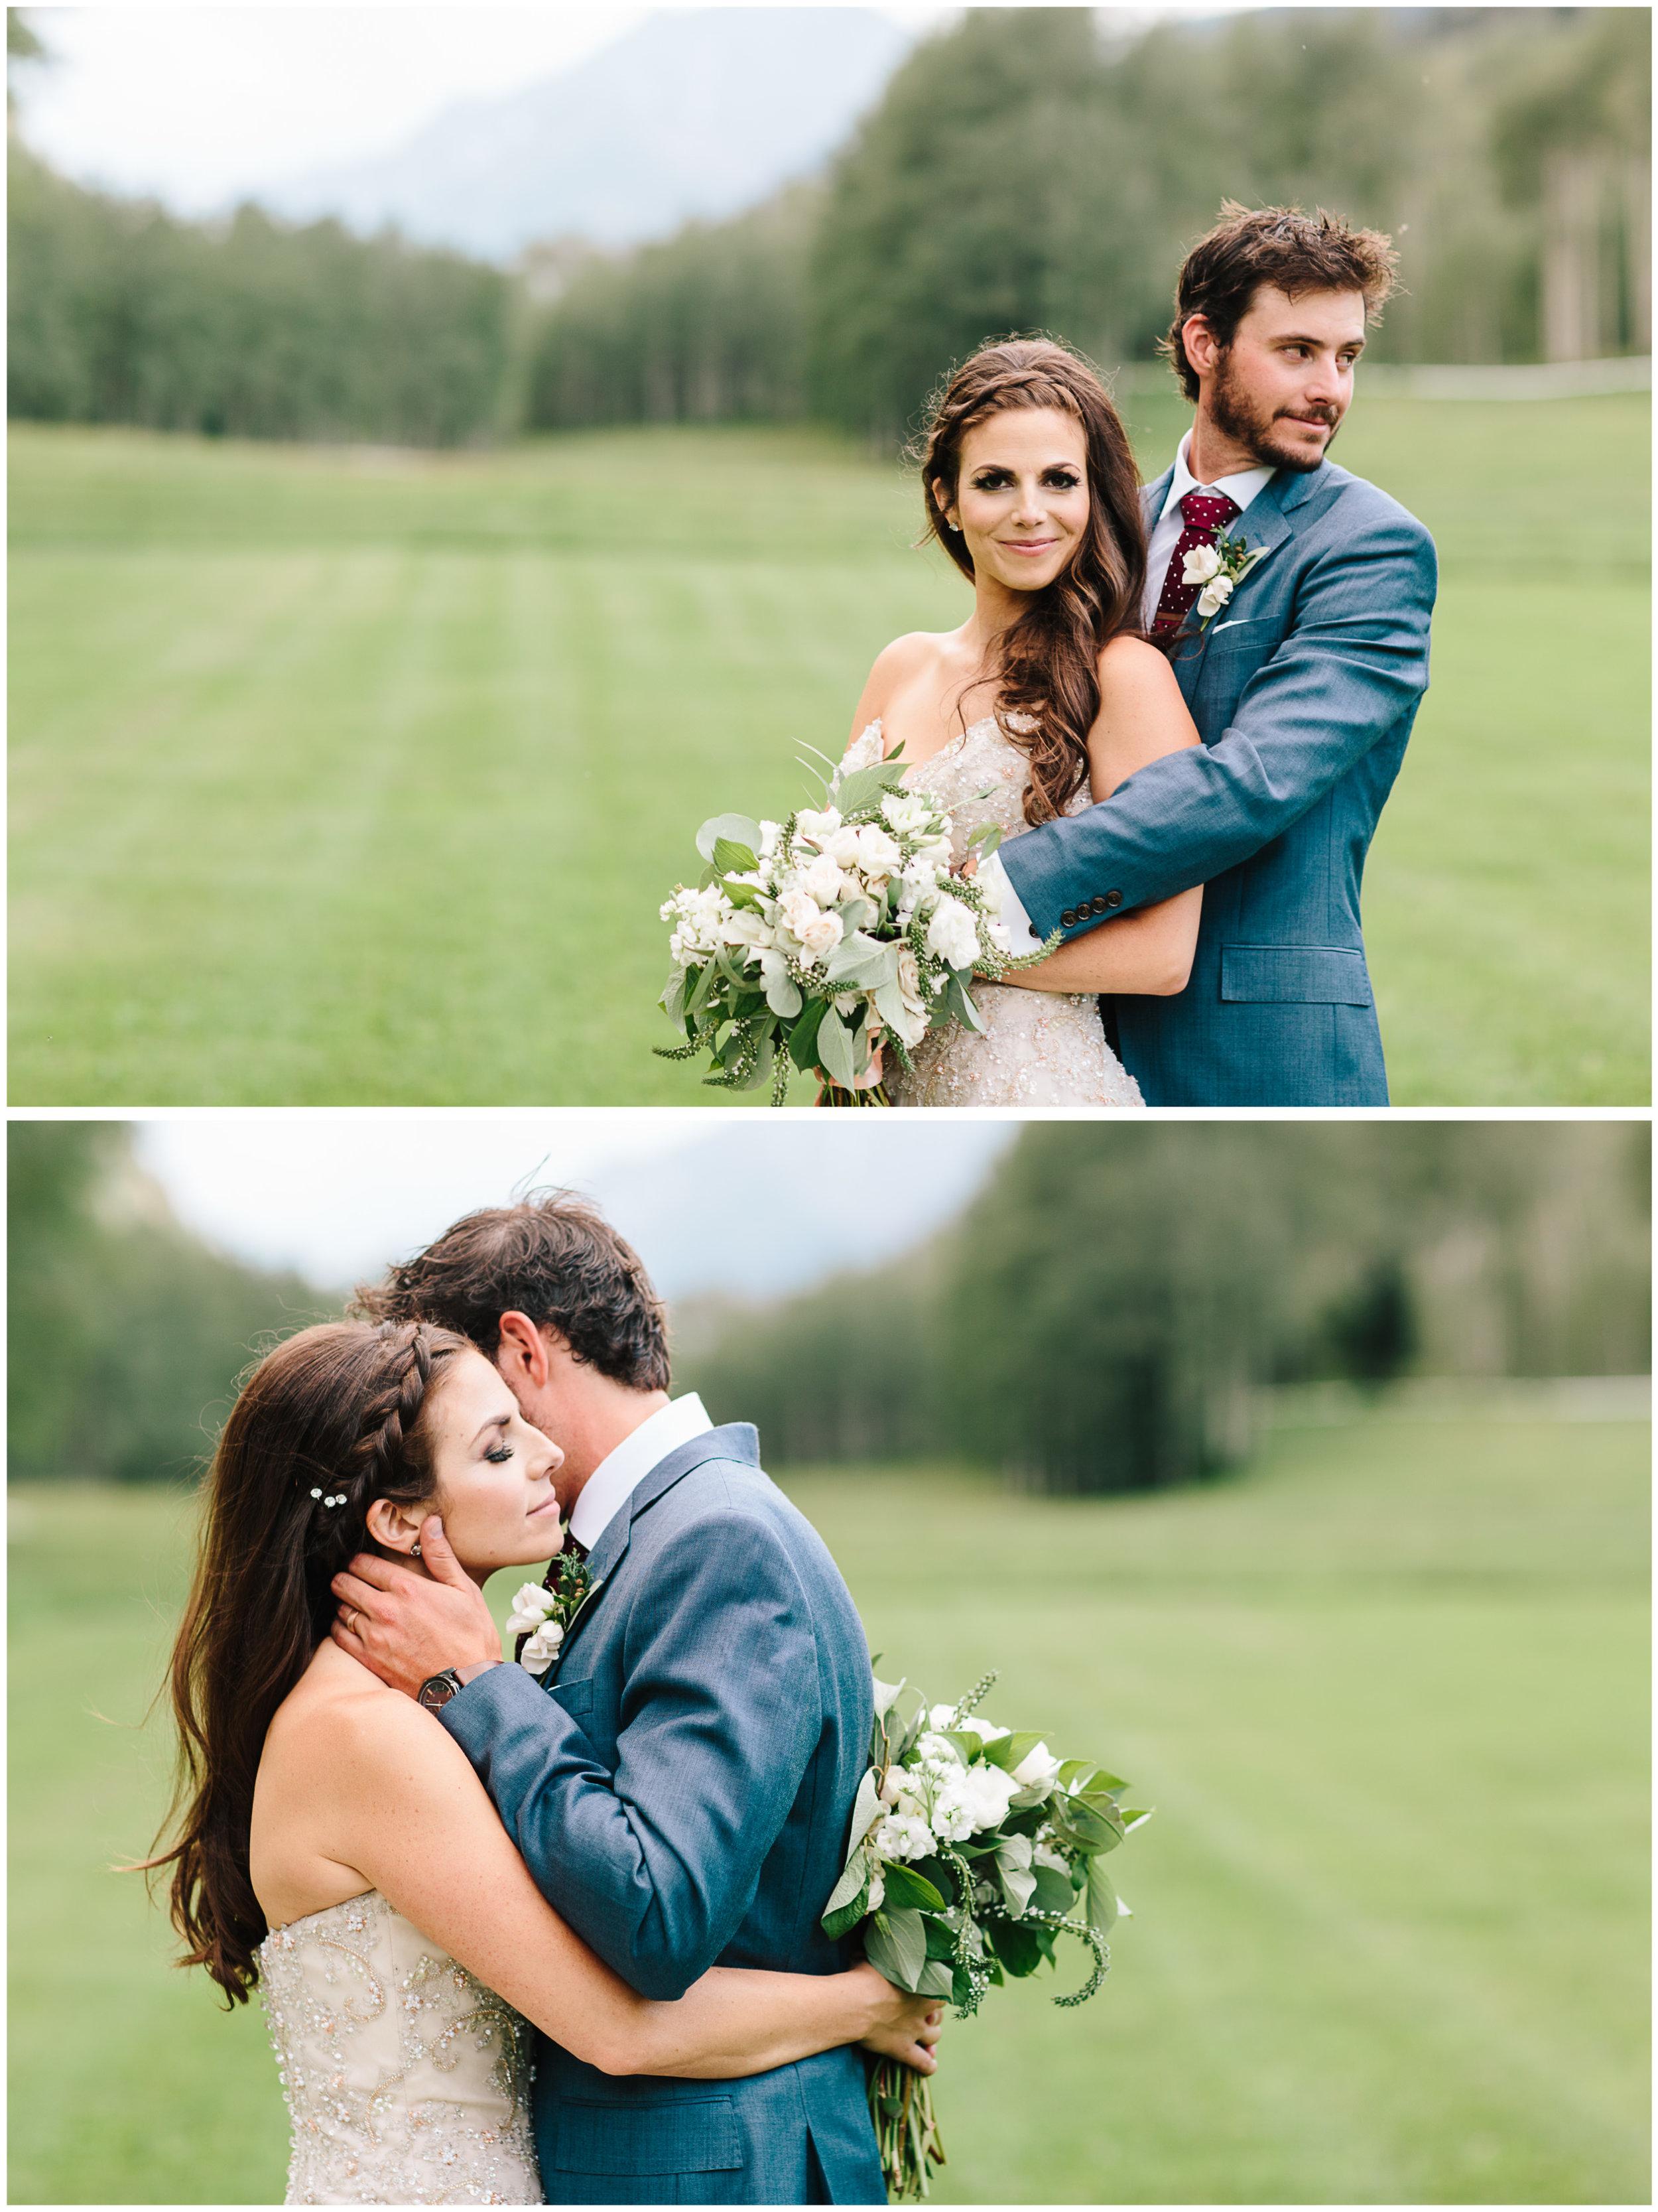 aspen_wedding_59.jpg